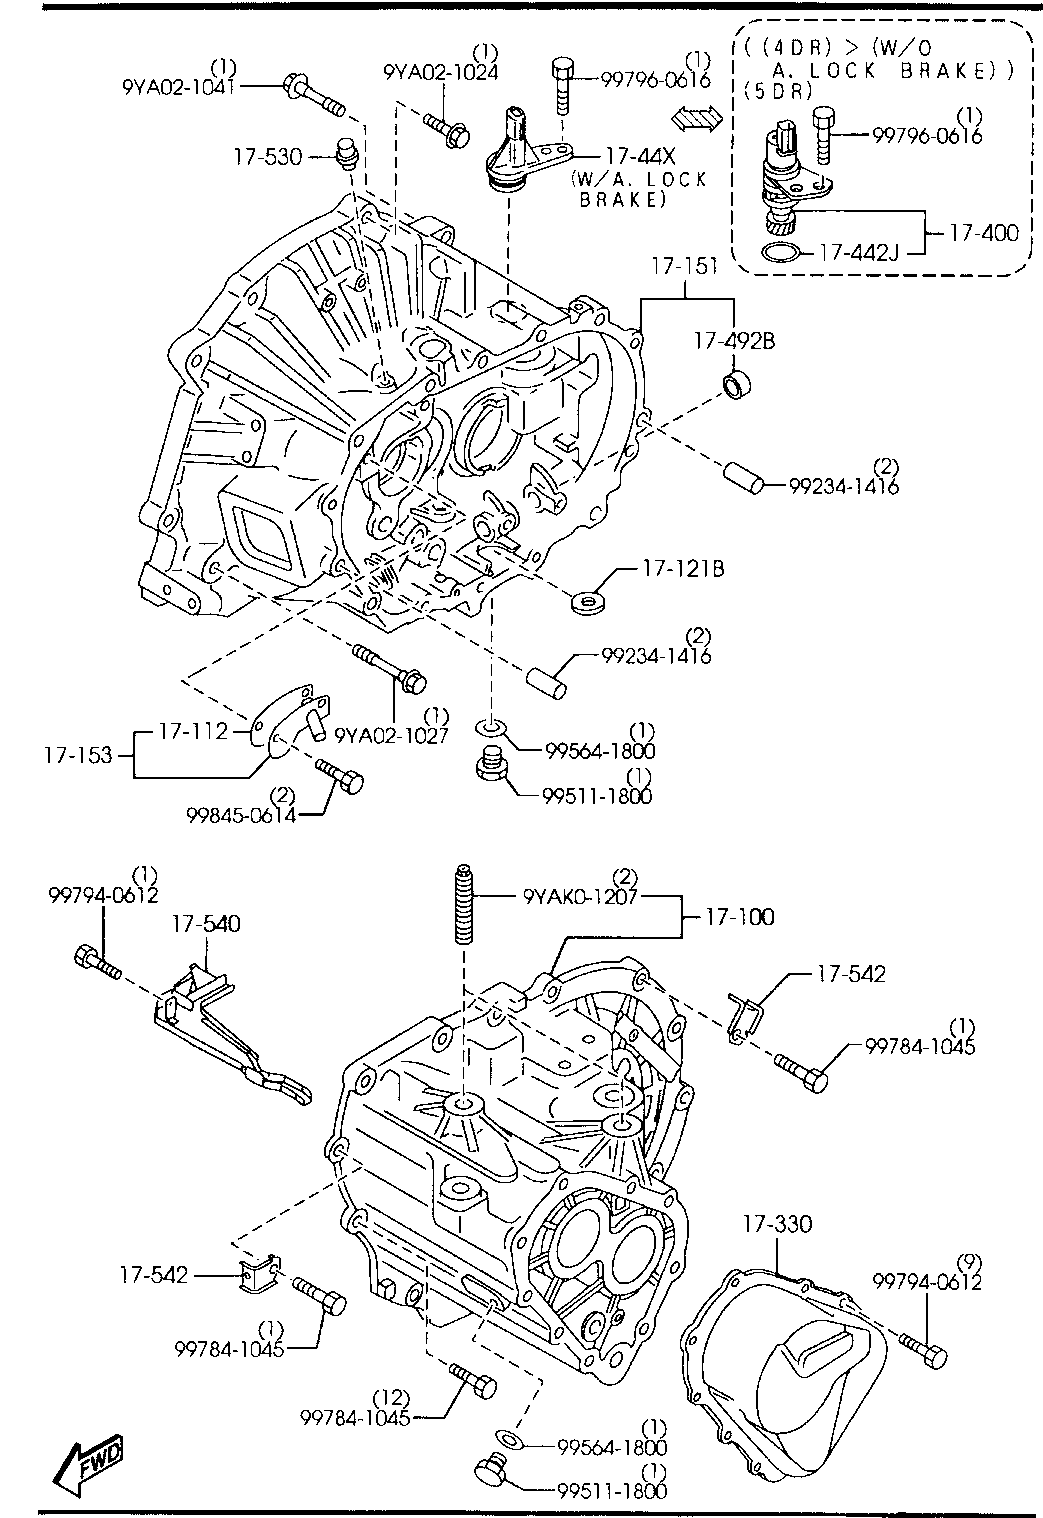 USA, 2004 MAZDA3, GASOLINE-ENGINE 4-CYLINDER TRANSMISSION